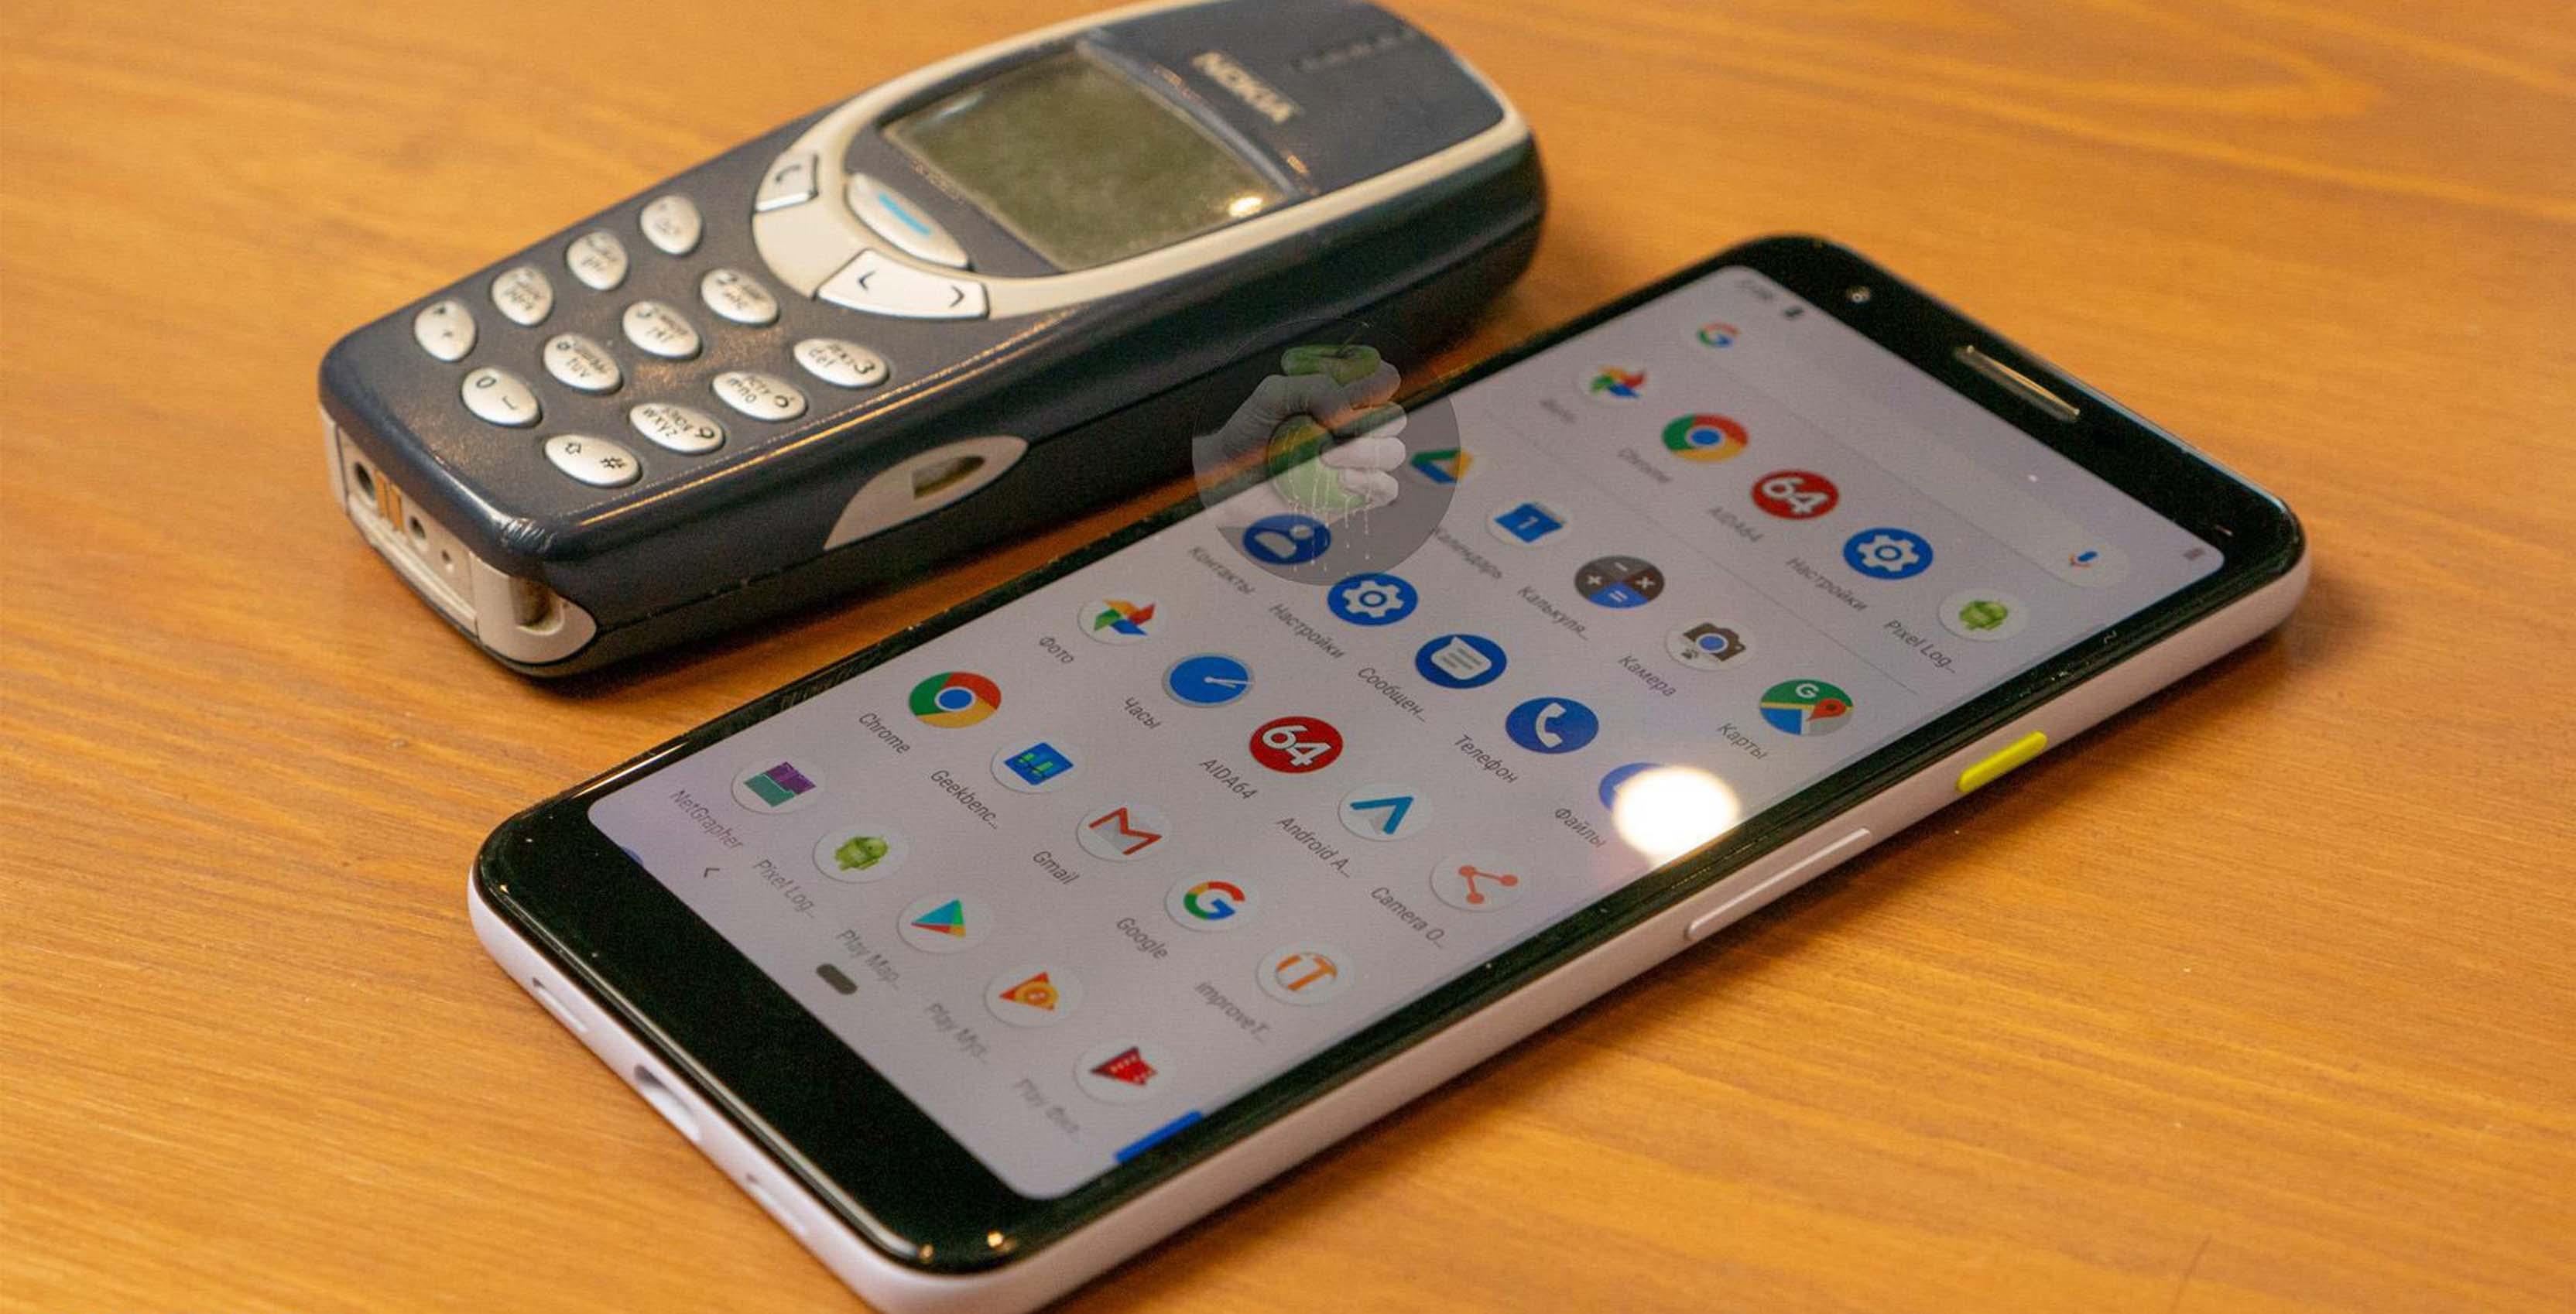 Pixel 3 Lite with Nokia 3310